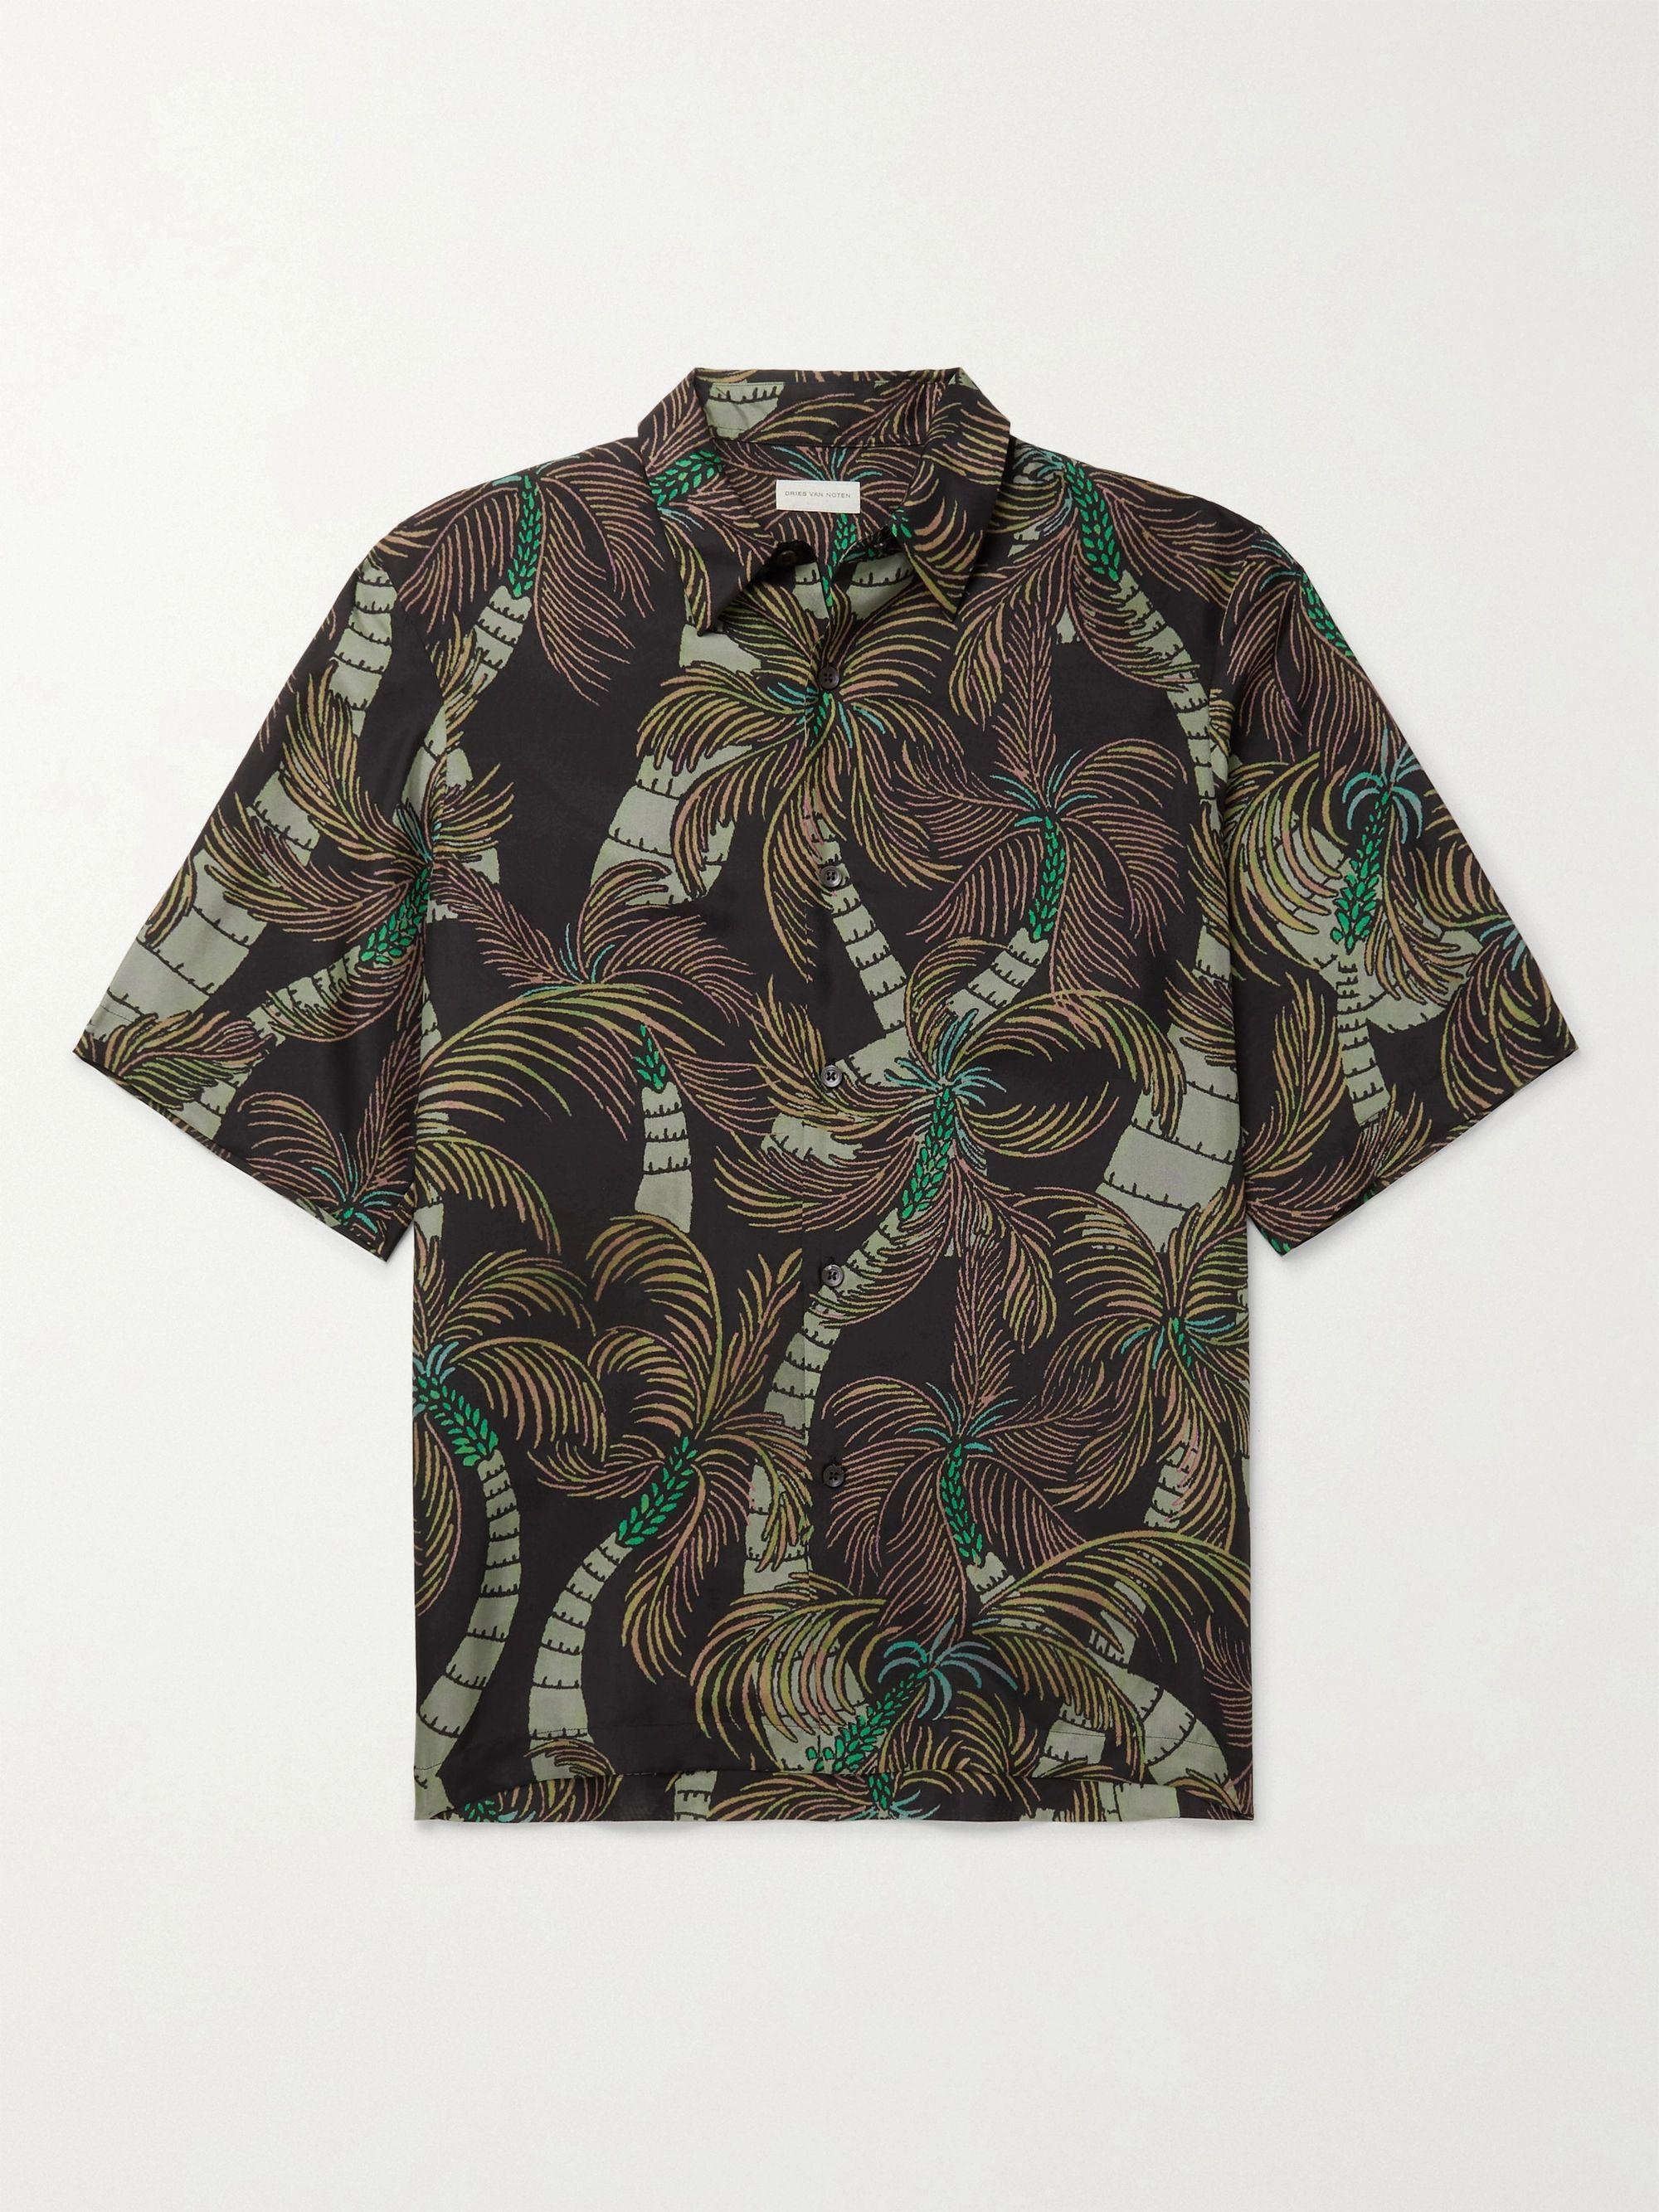 Dries Van Noten Printed Silk Shirt,Brown